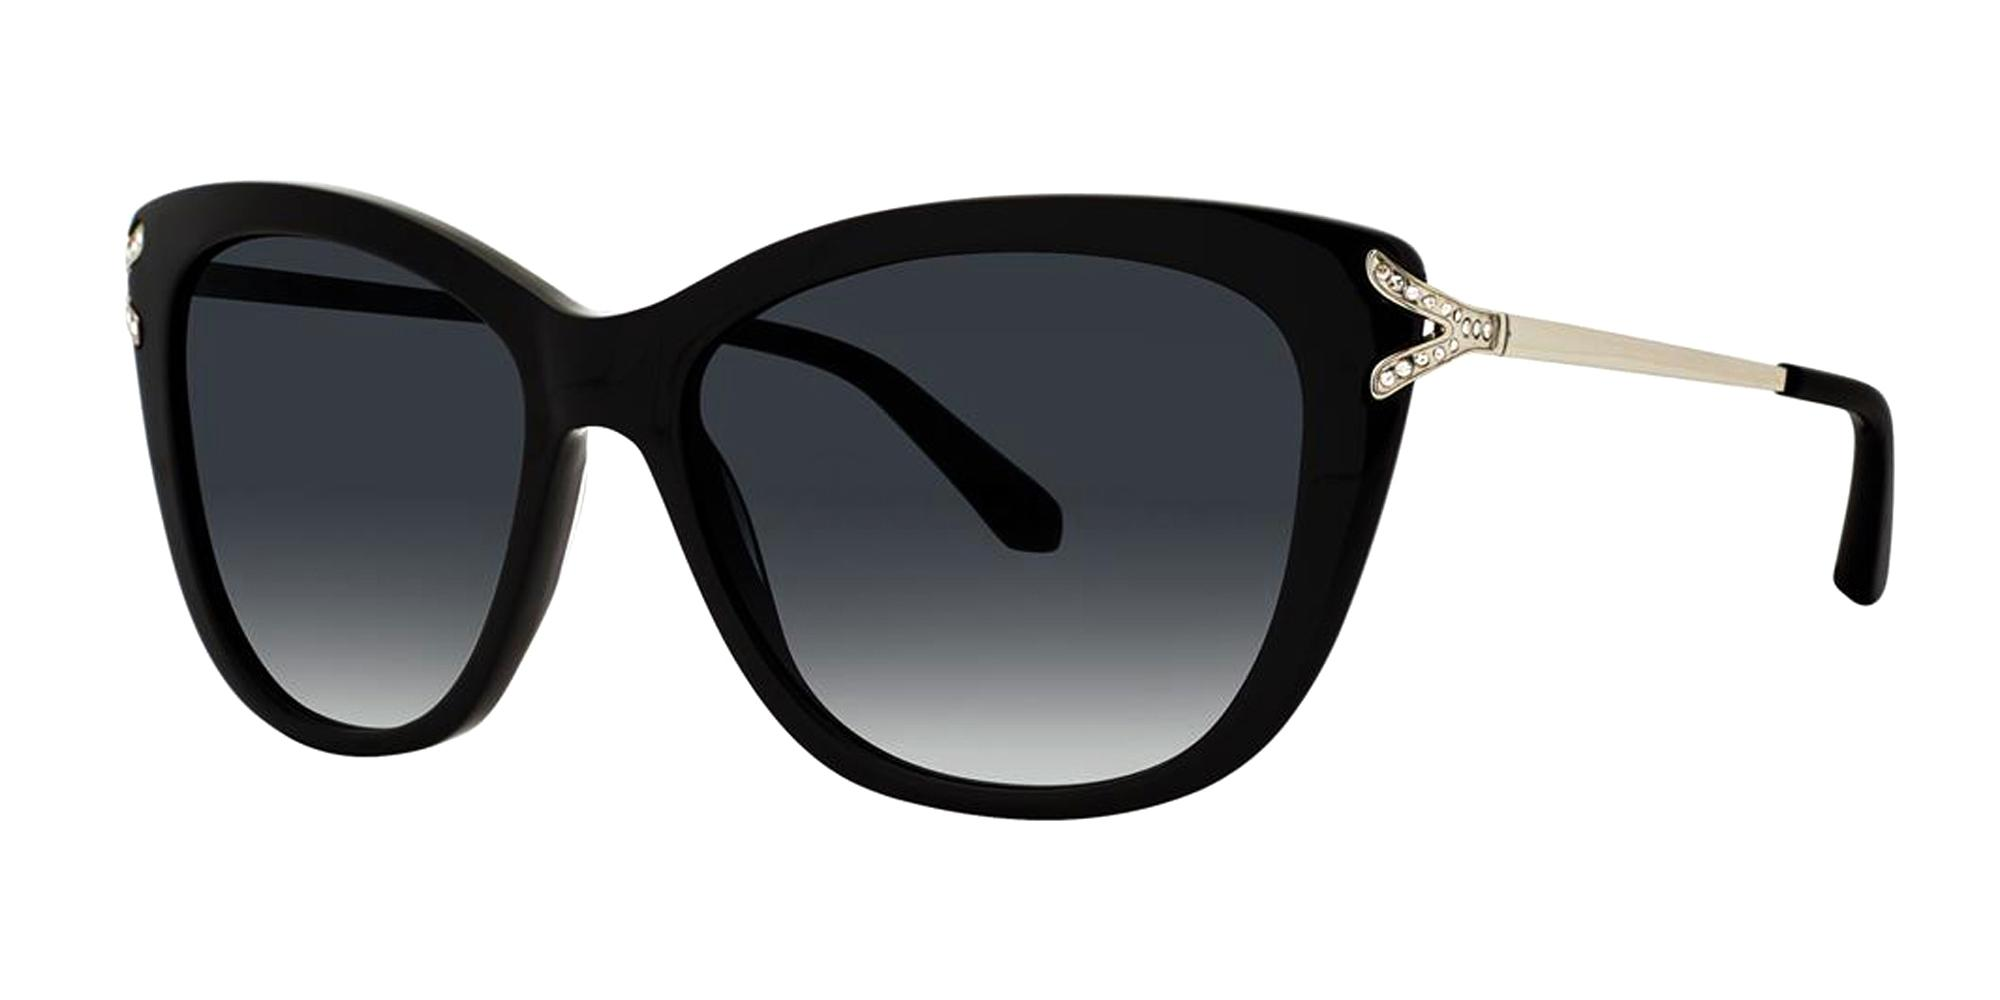 Noir TALIYA Sunglasses, Vera Wang Luxe